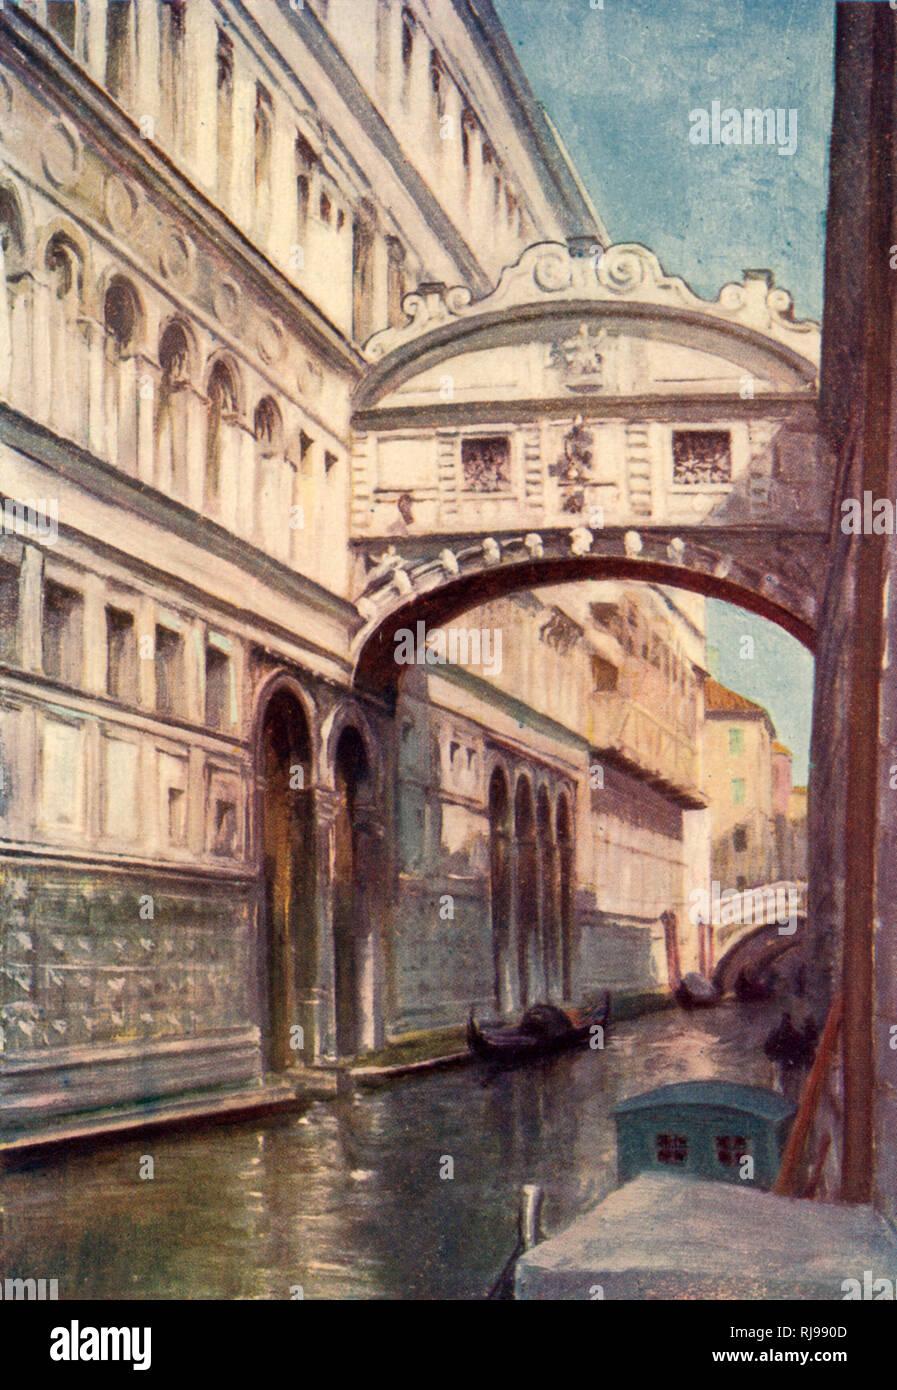 Venice: the Bridge of Sighs - Stock Image